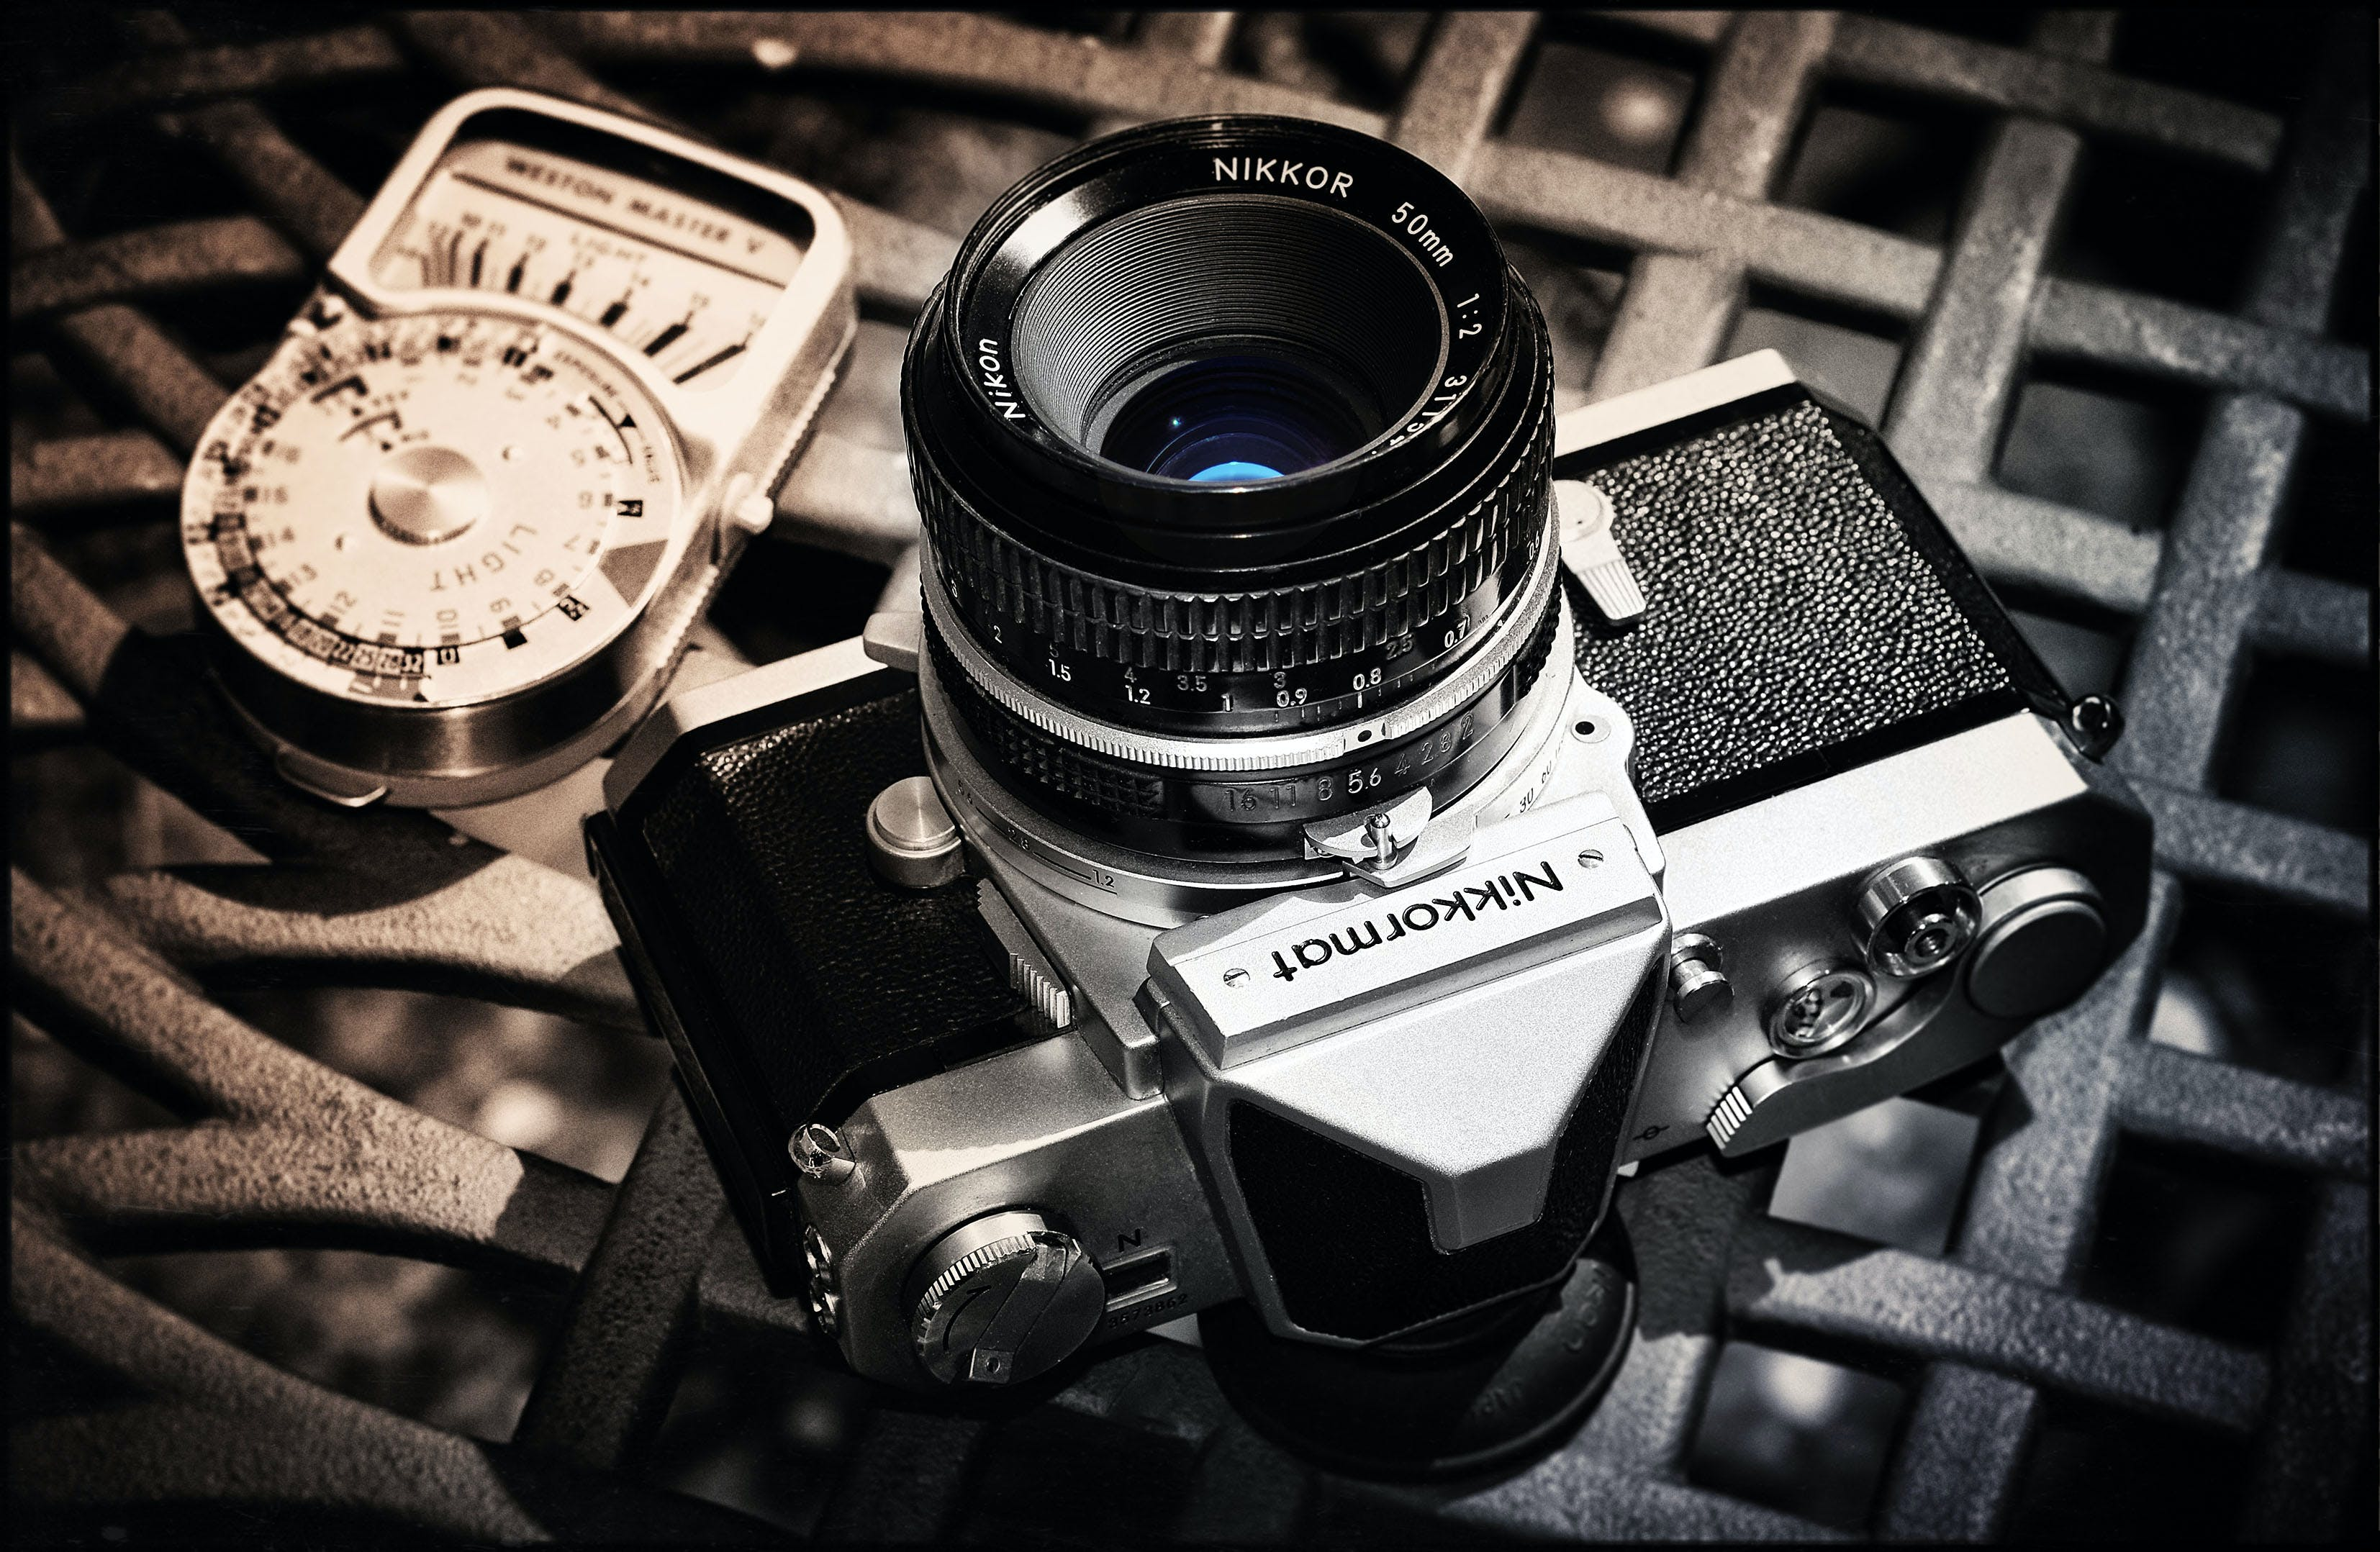 Gratis stockfoto met camera, cameralens, close-up, elektronica